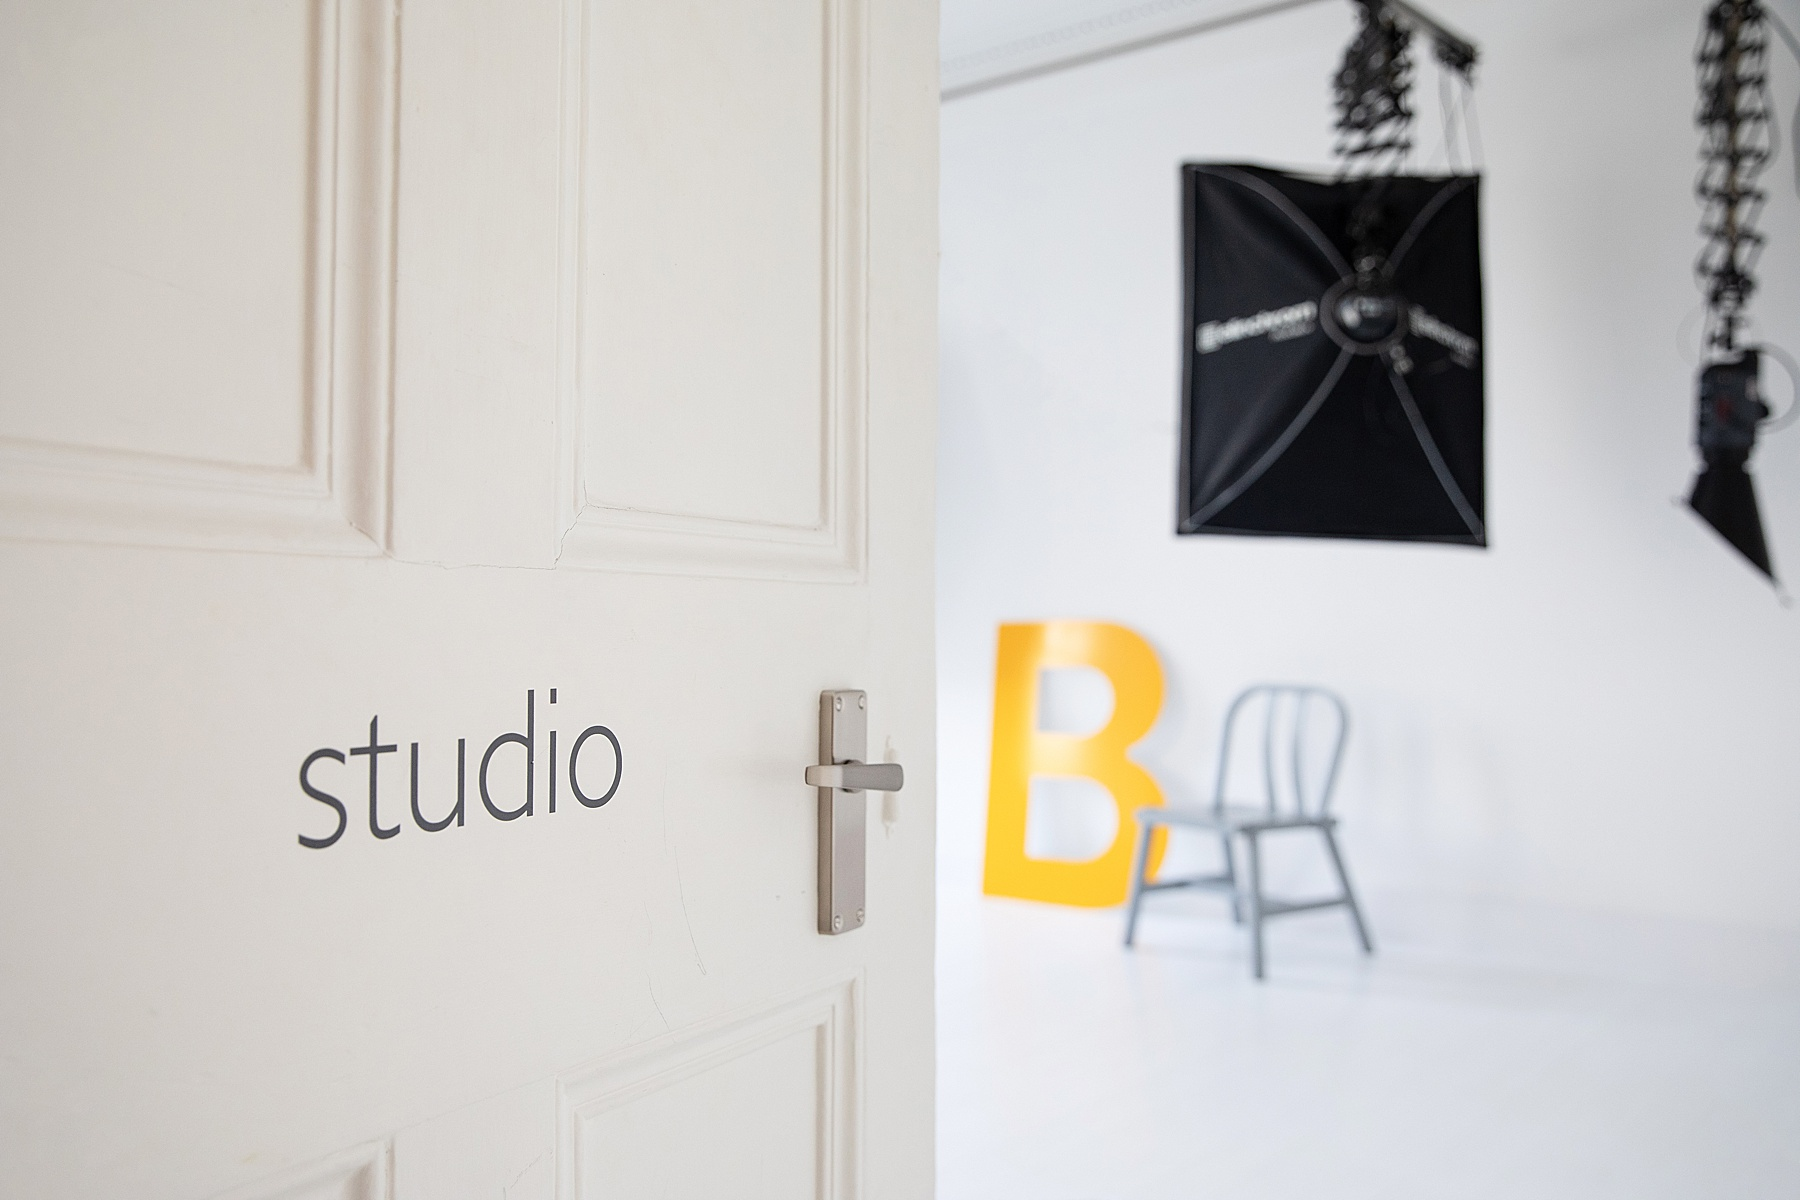 Edinburgh photography studio